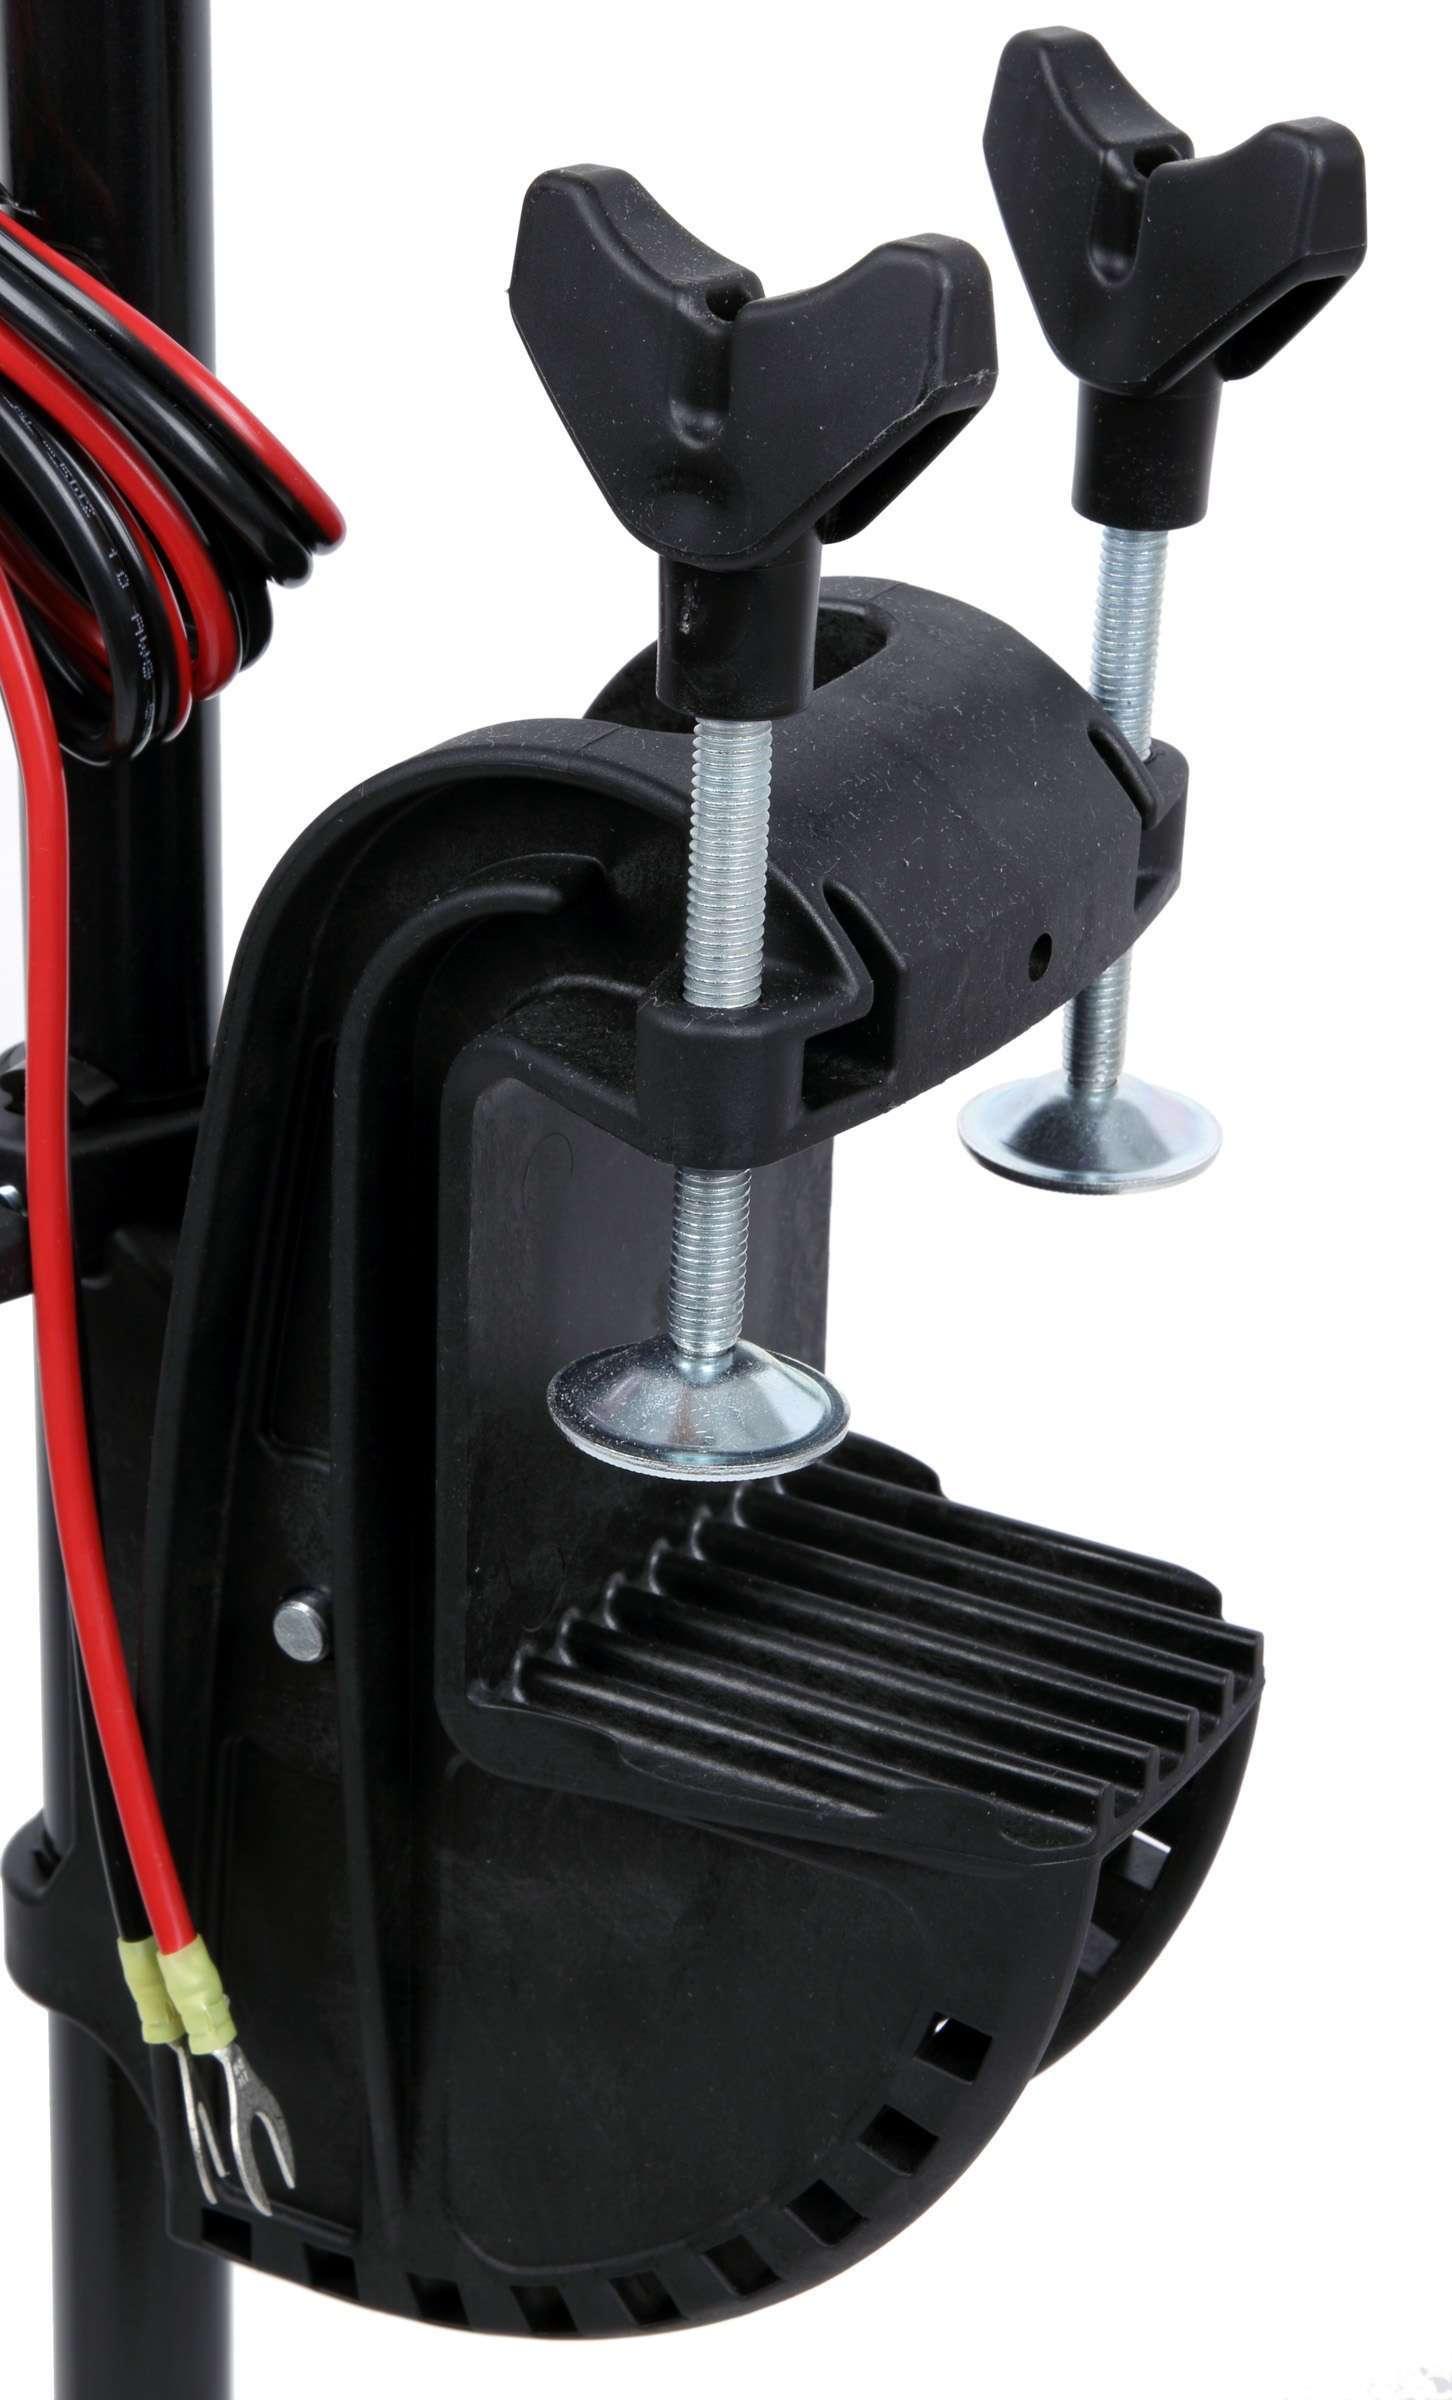 Silnik elektryczny Minn Kota Endura C2 34 lbs z miernikiem